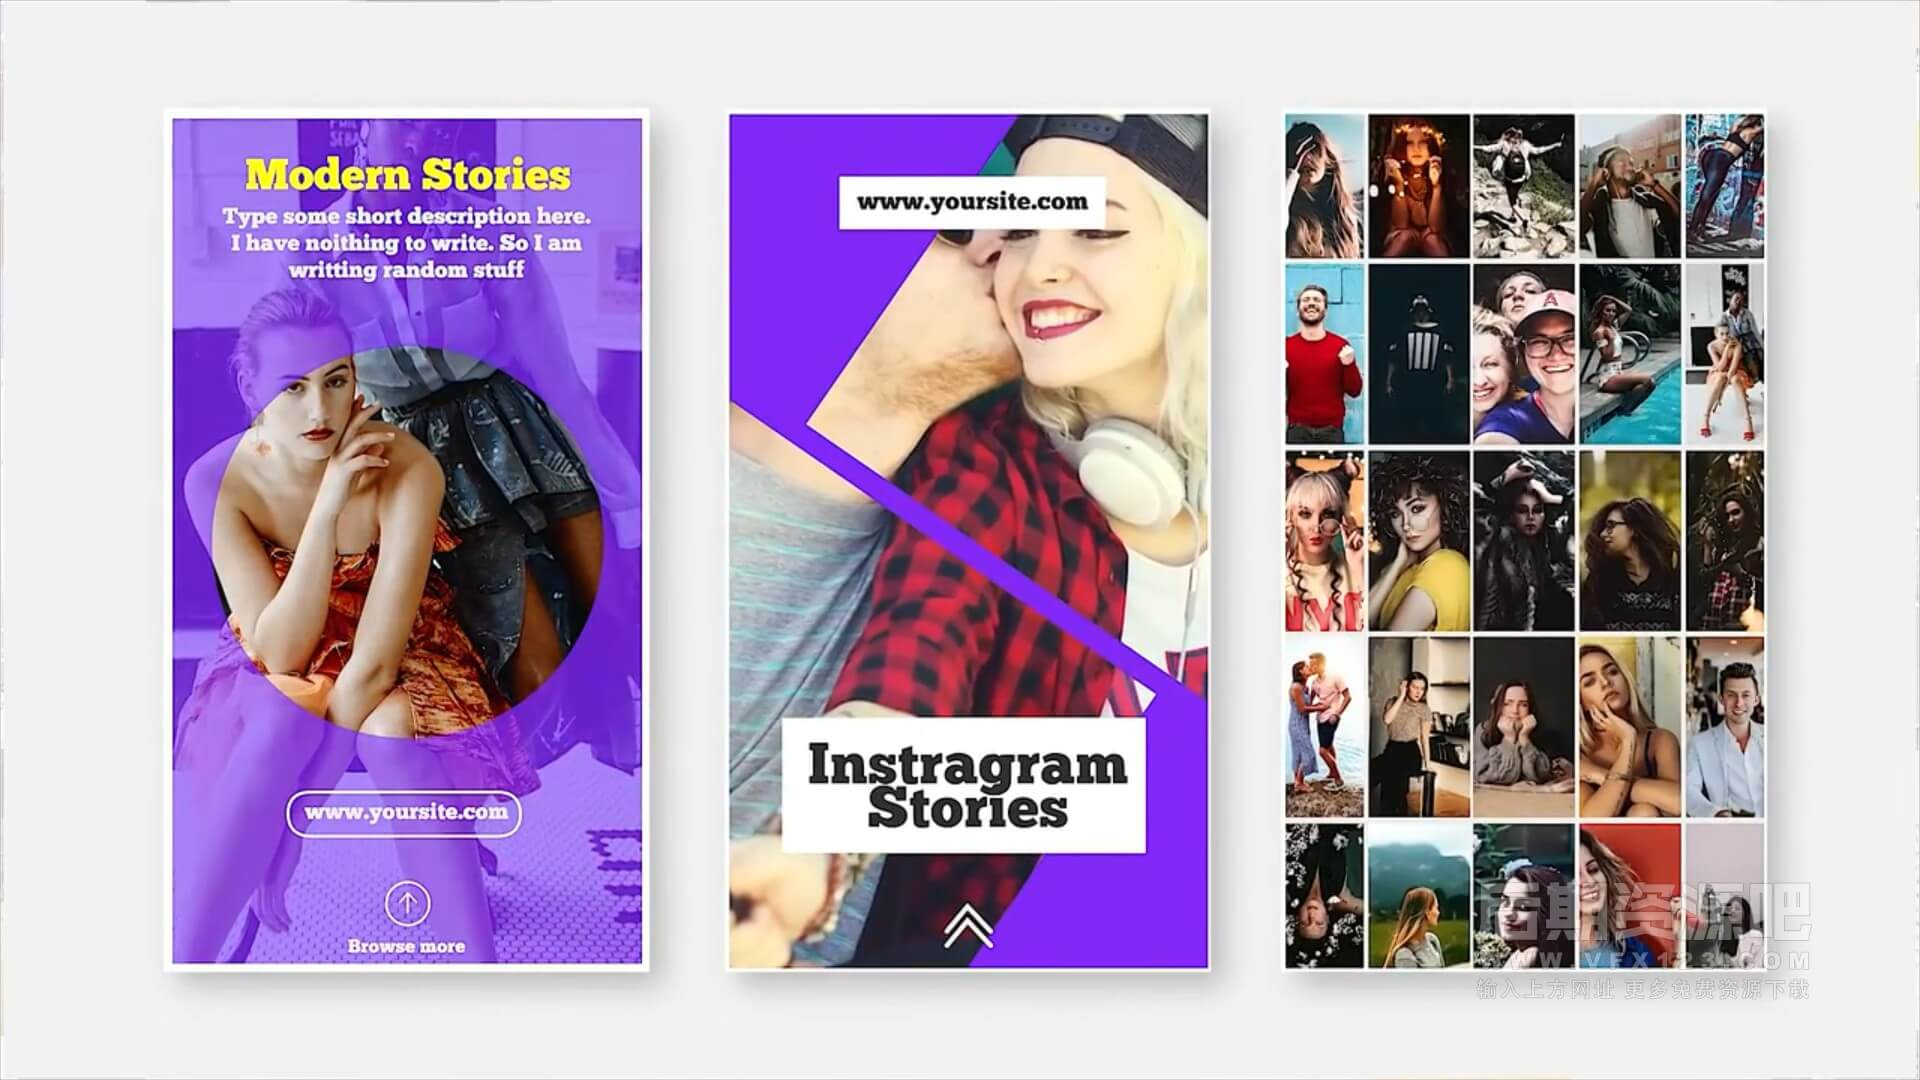 fcpx竖屏模板 30组手机竖屏短视频片头模板 Ins Stories V.5